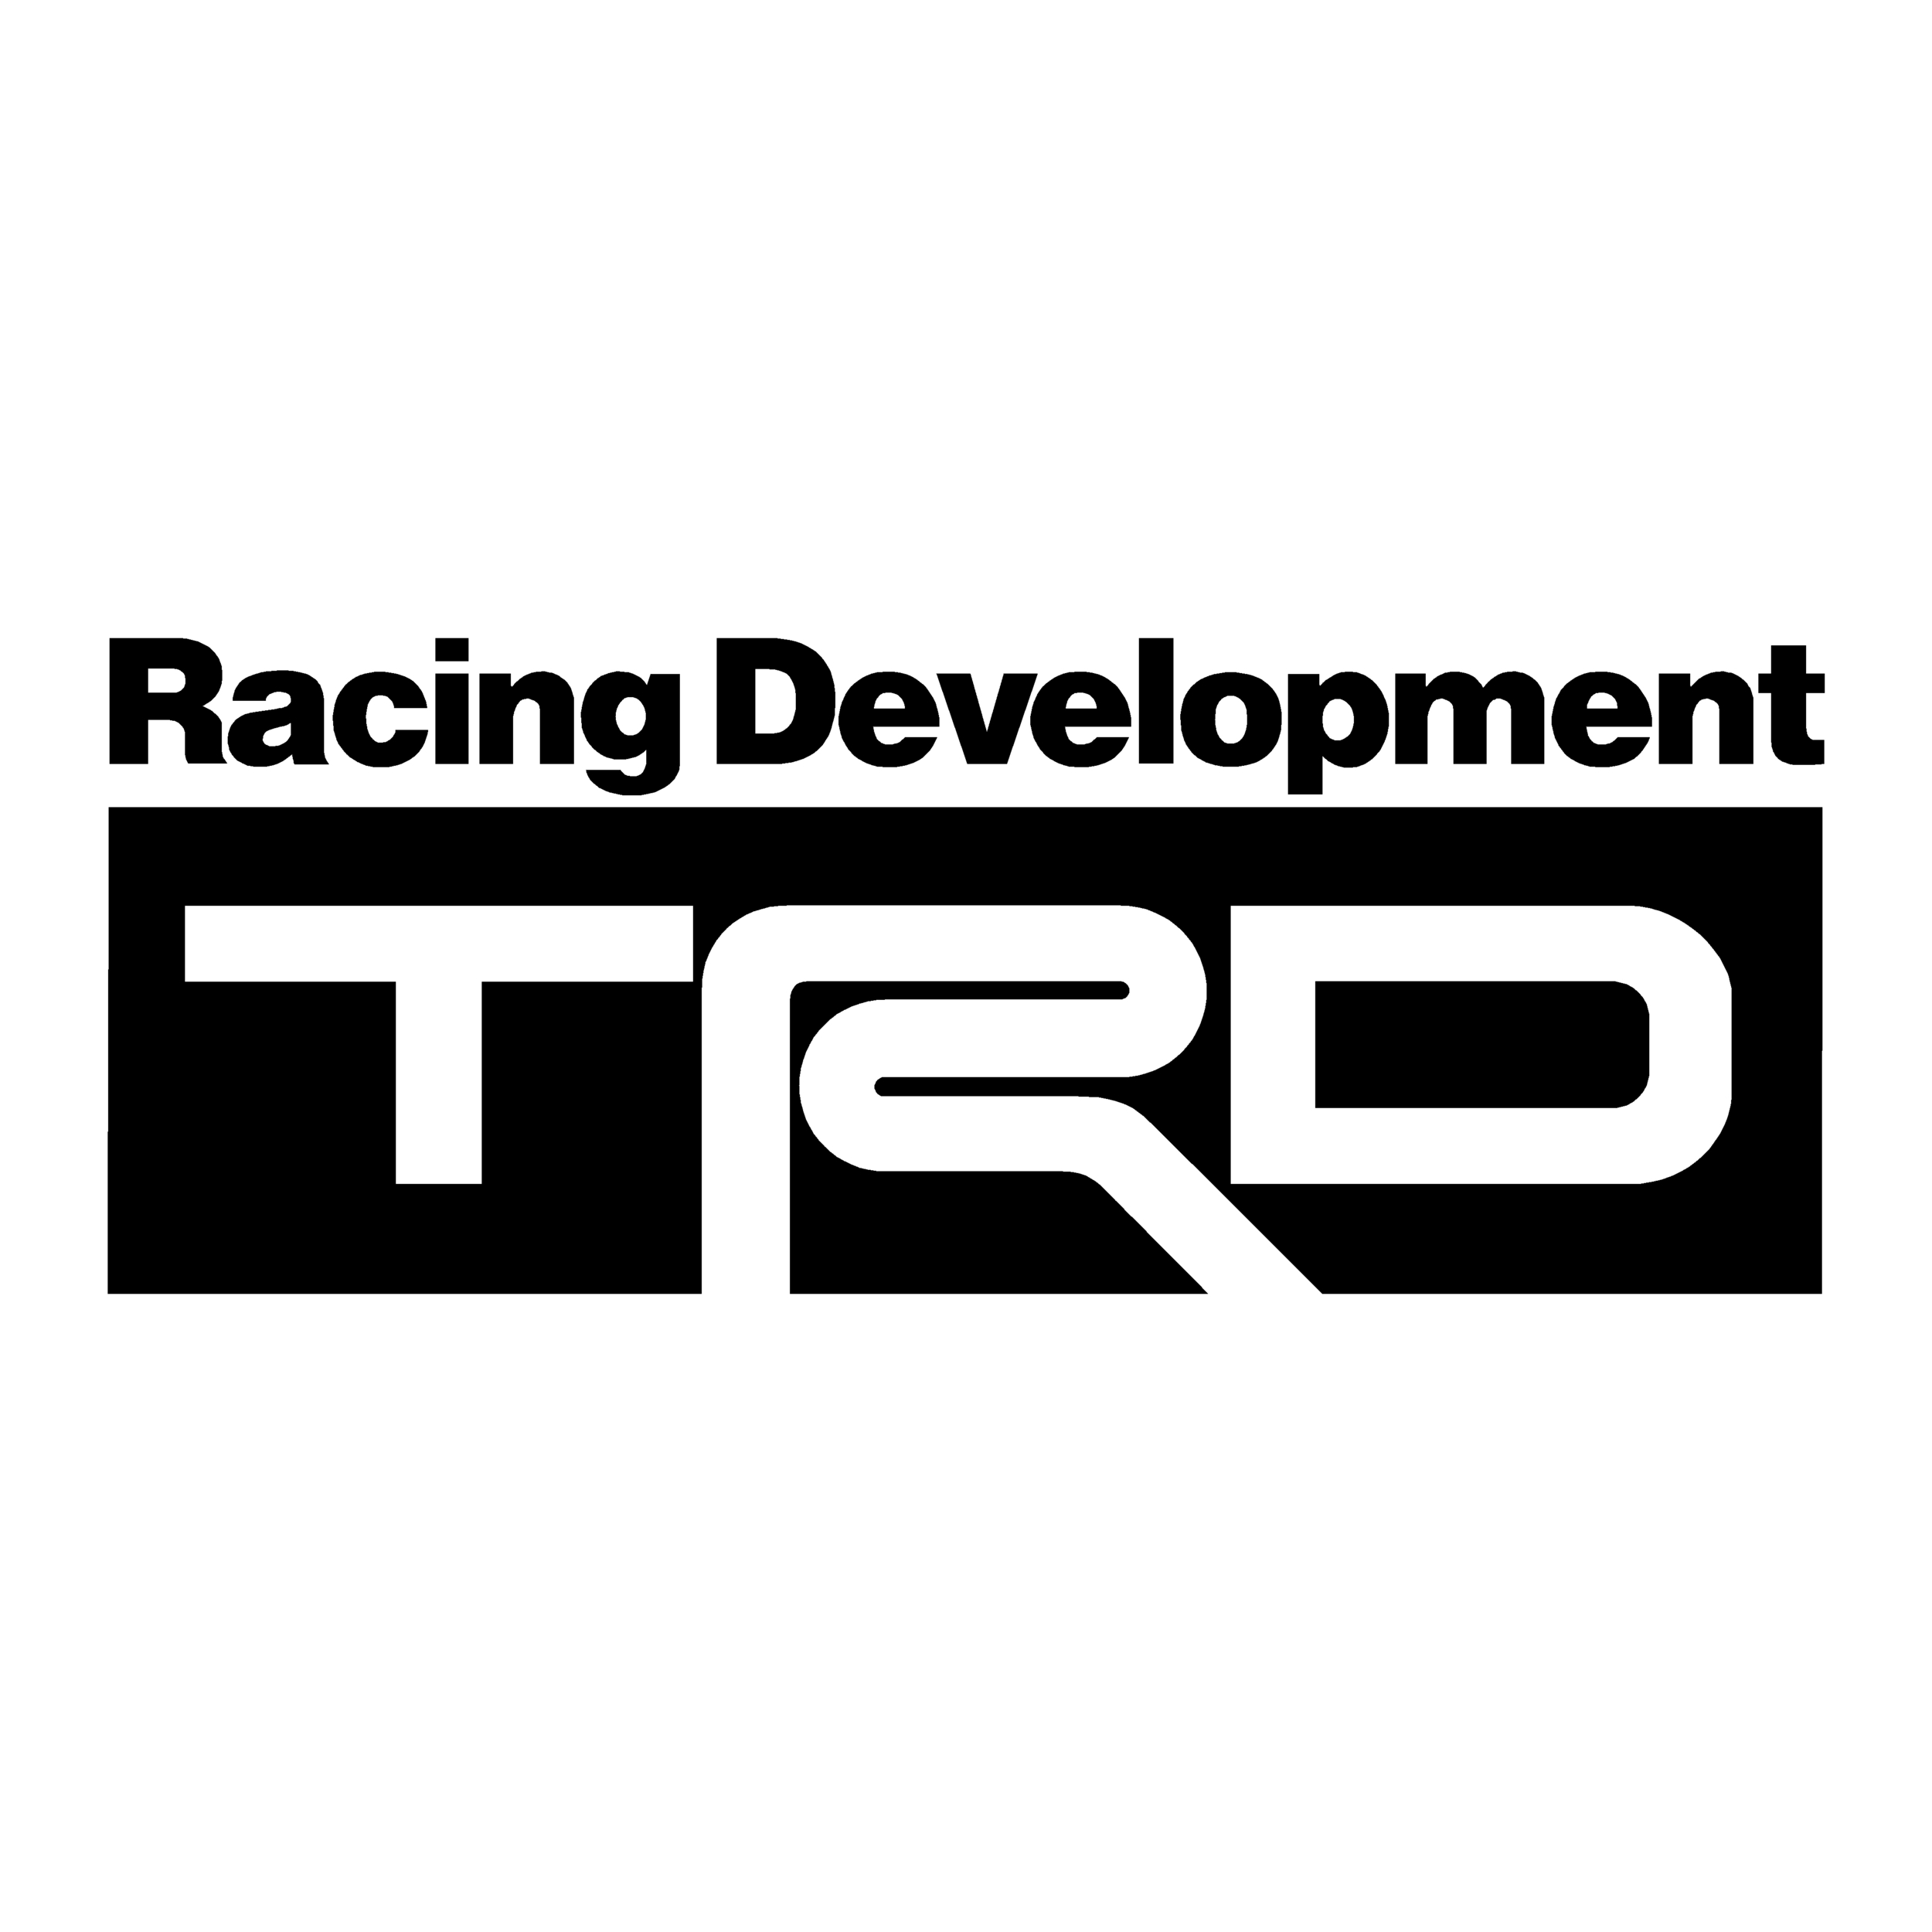 stickers trd ref 1 tuning audio sonorisation car auto moto camion competition deco rallye autocollant